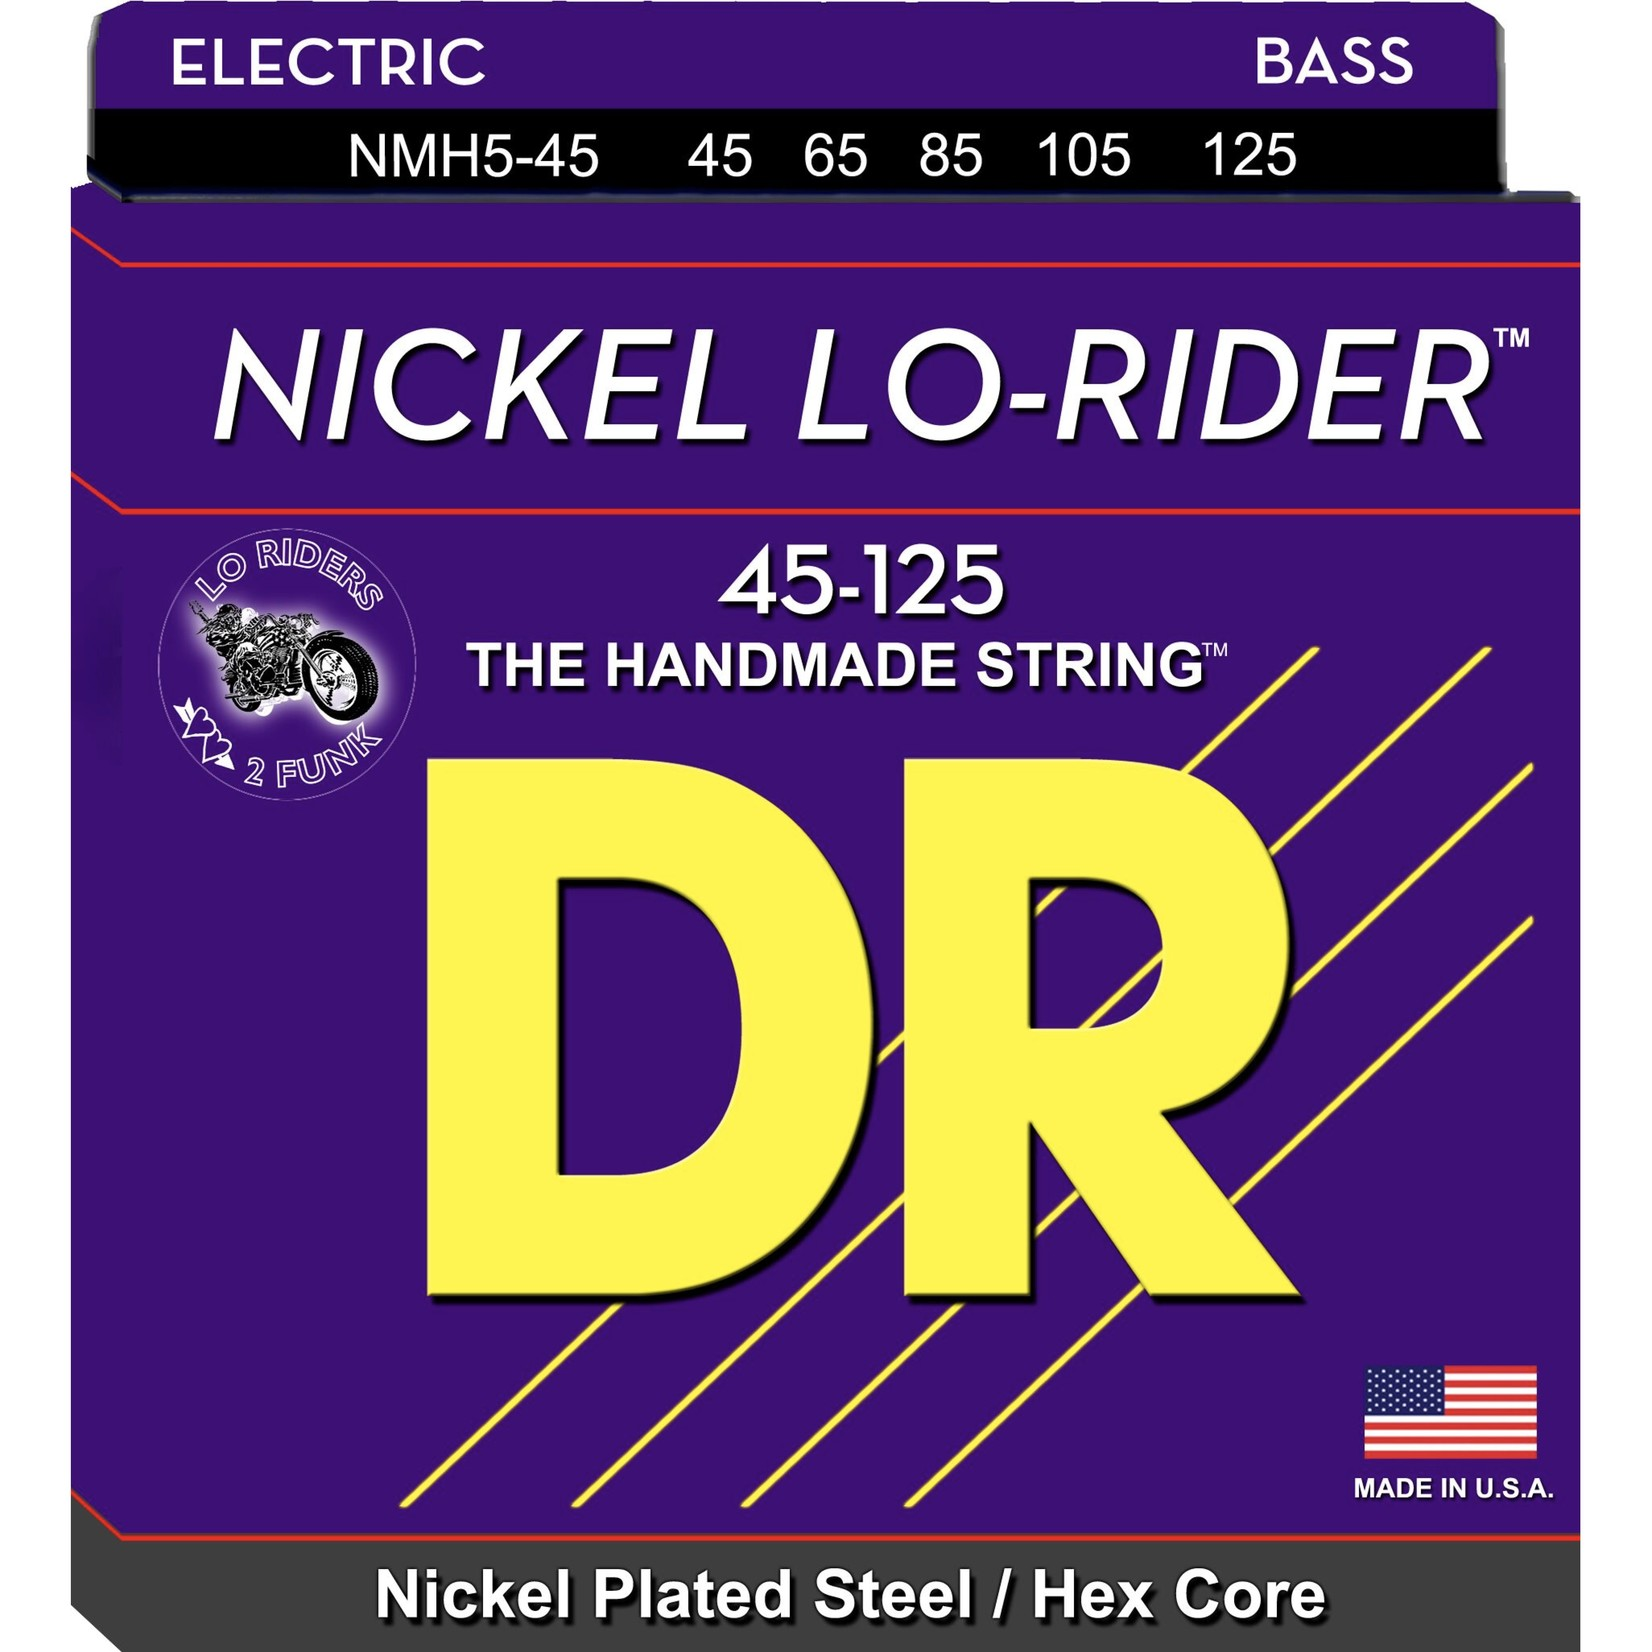 DR Strings DR Strings NICKEL LO-RIDERª - Nickel Plated Bass Strings: 5-String Medium 45-125, NMH5-45